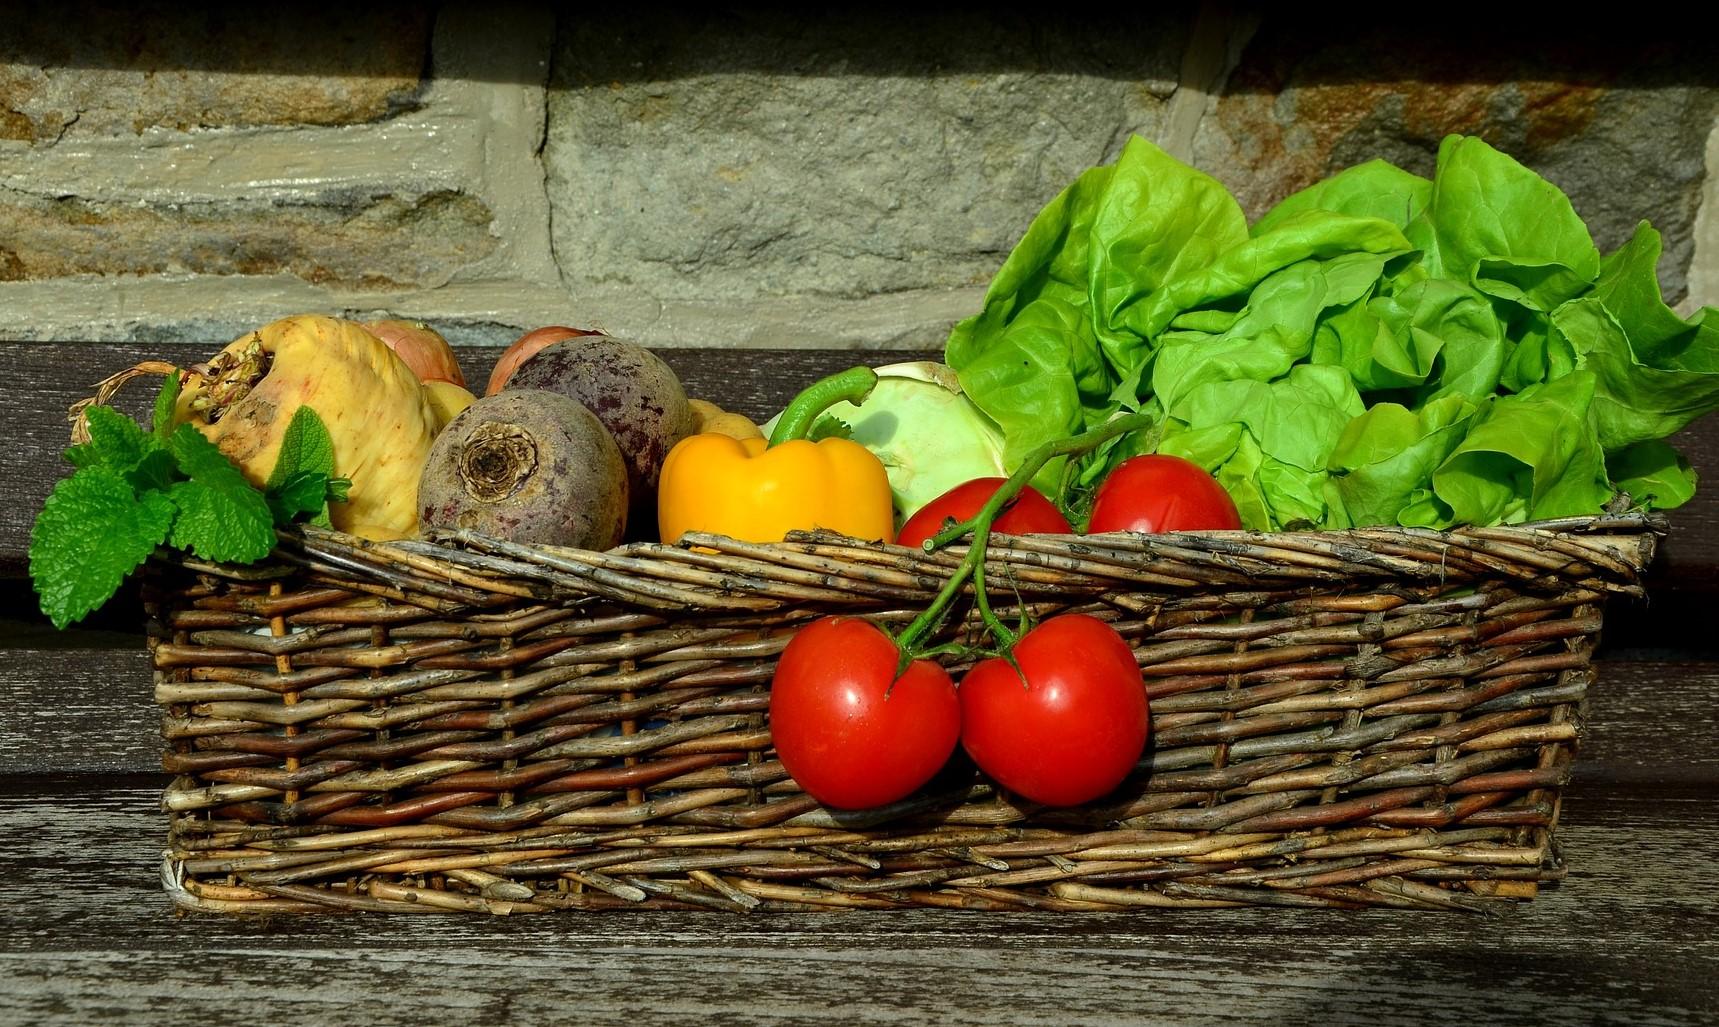 vegetables-752156_1920_1.jpg